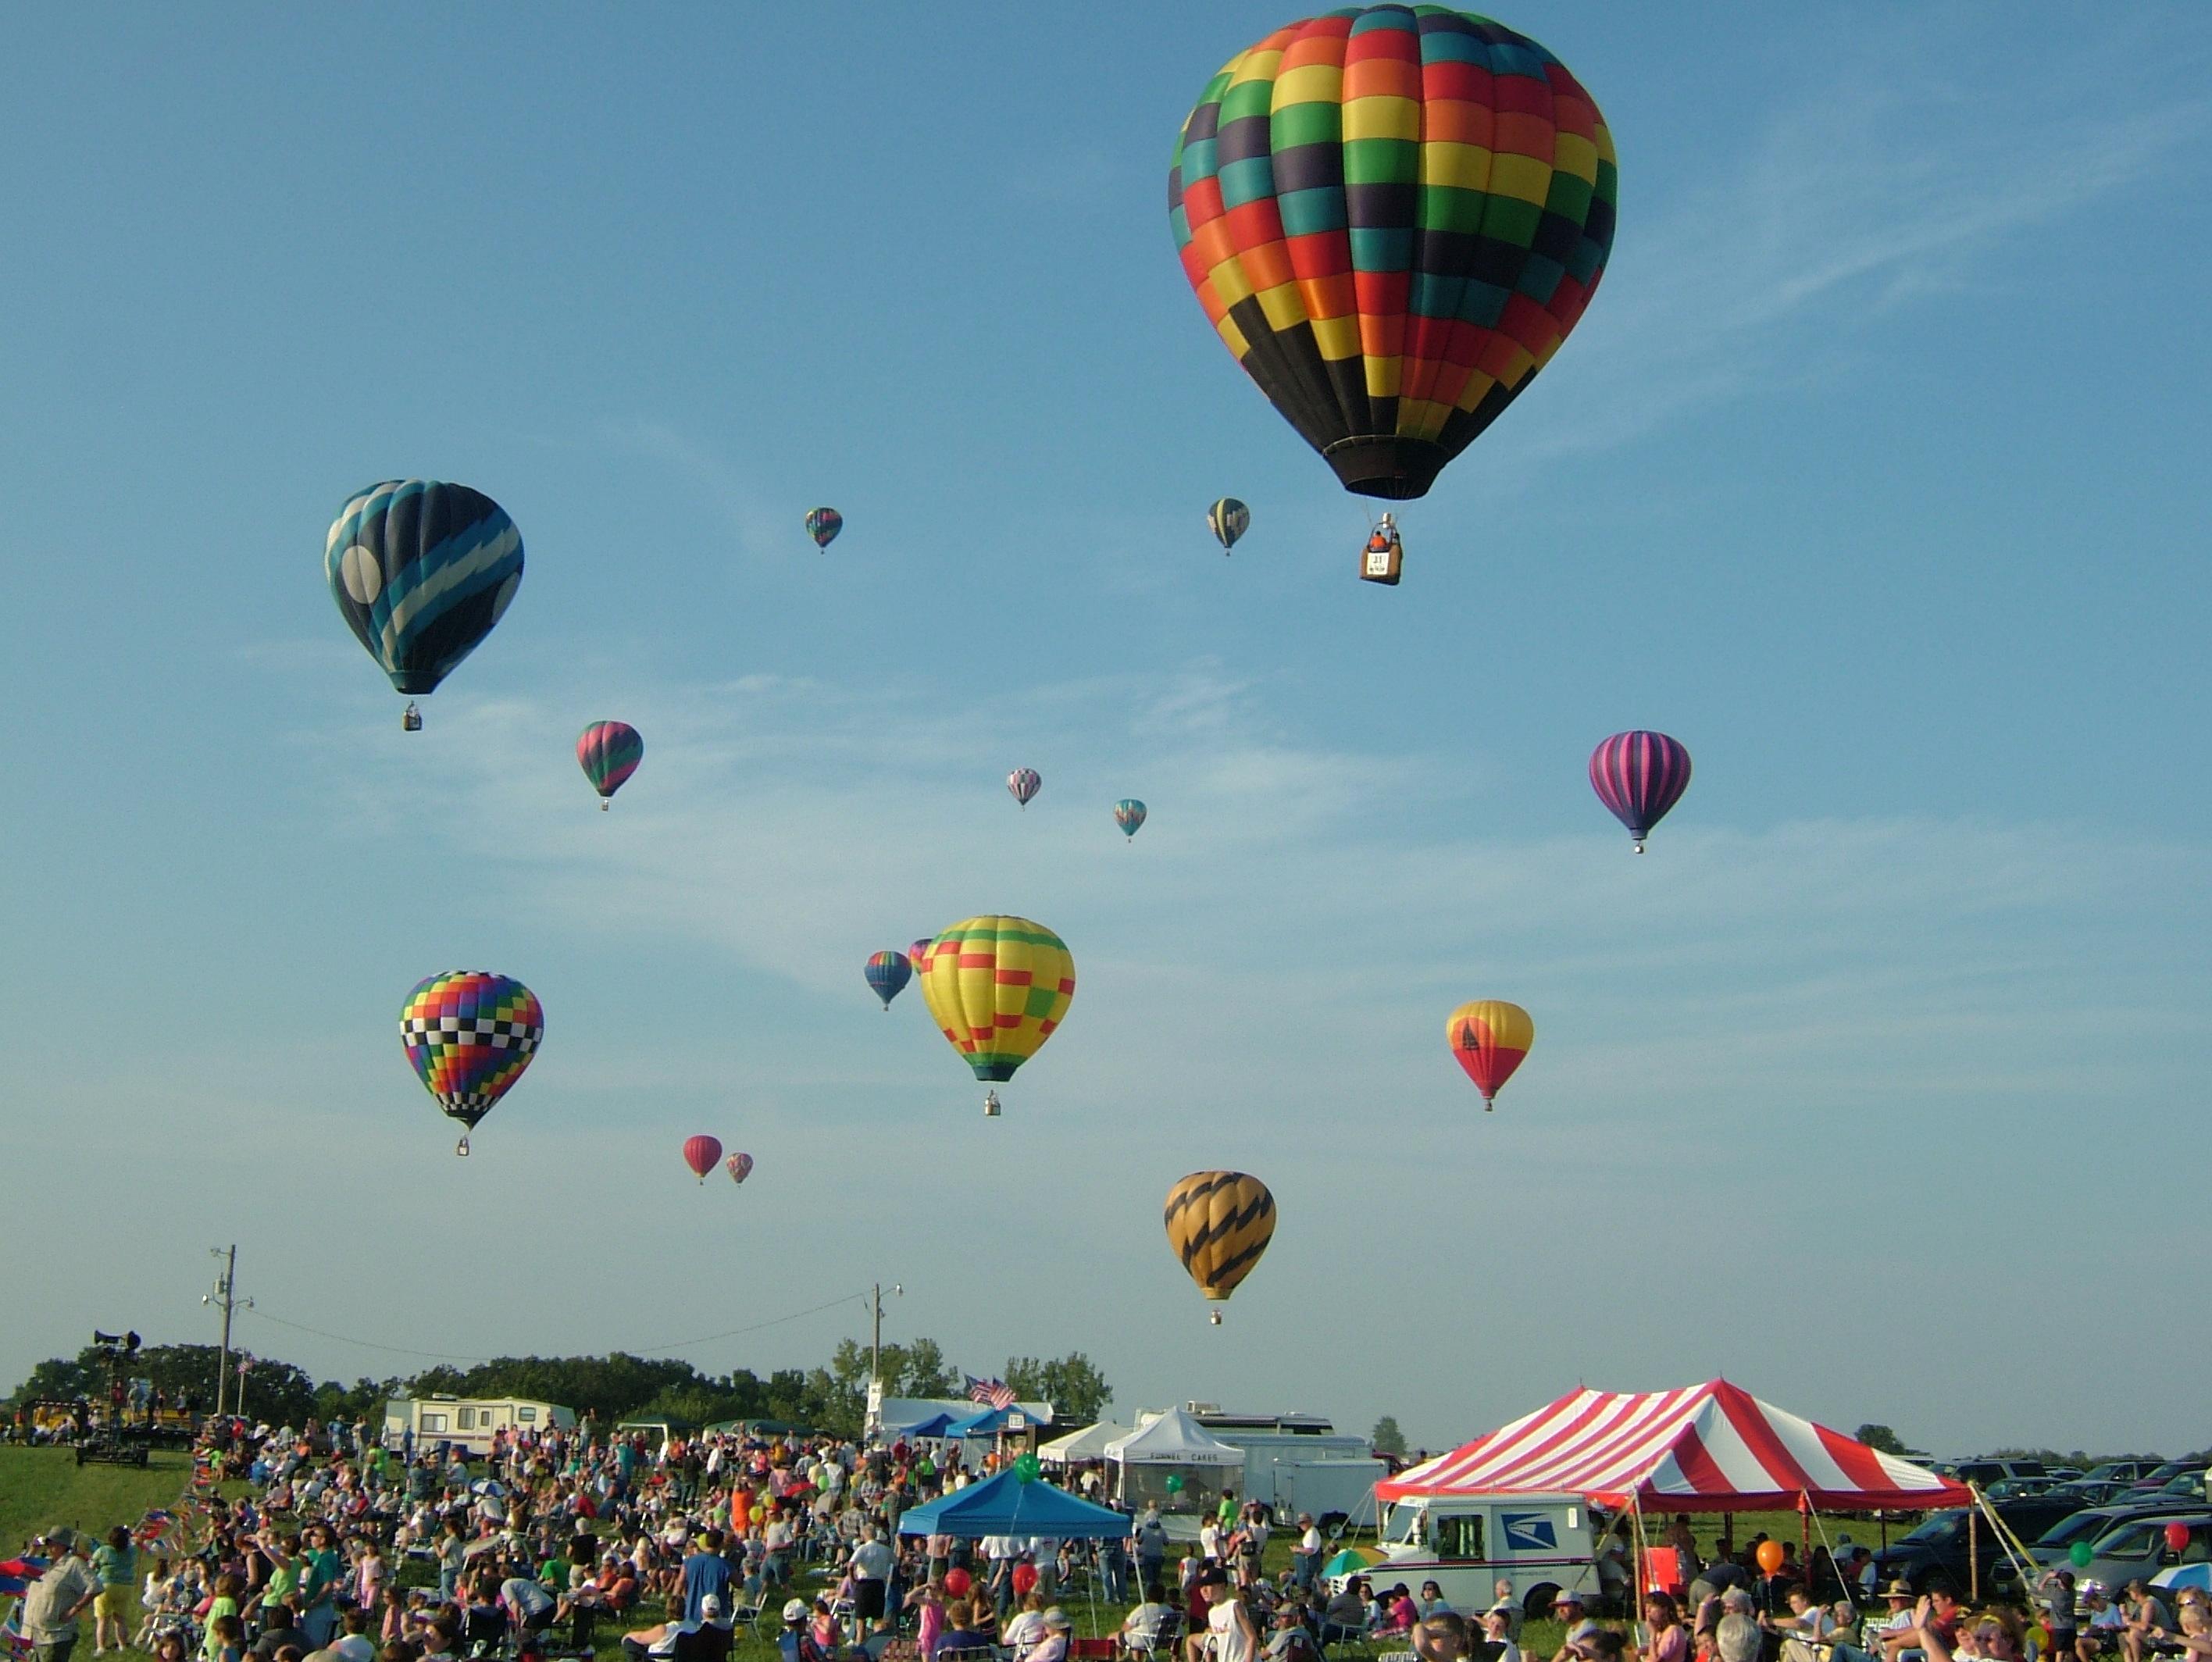 air balloon simple english wikipedia the free encyclopedia